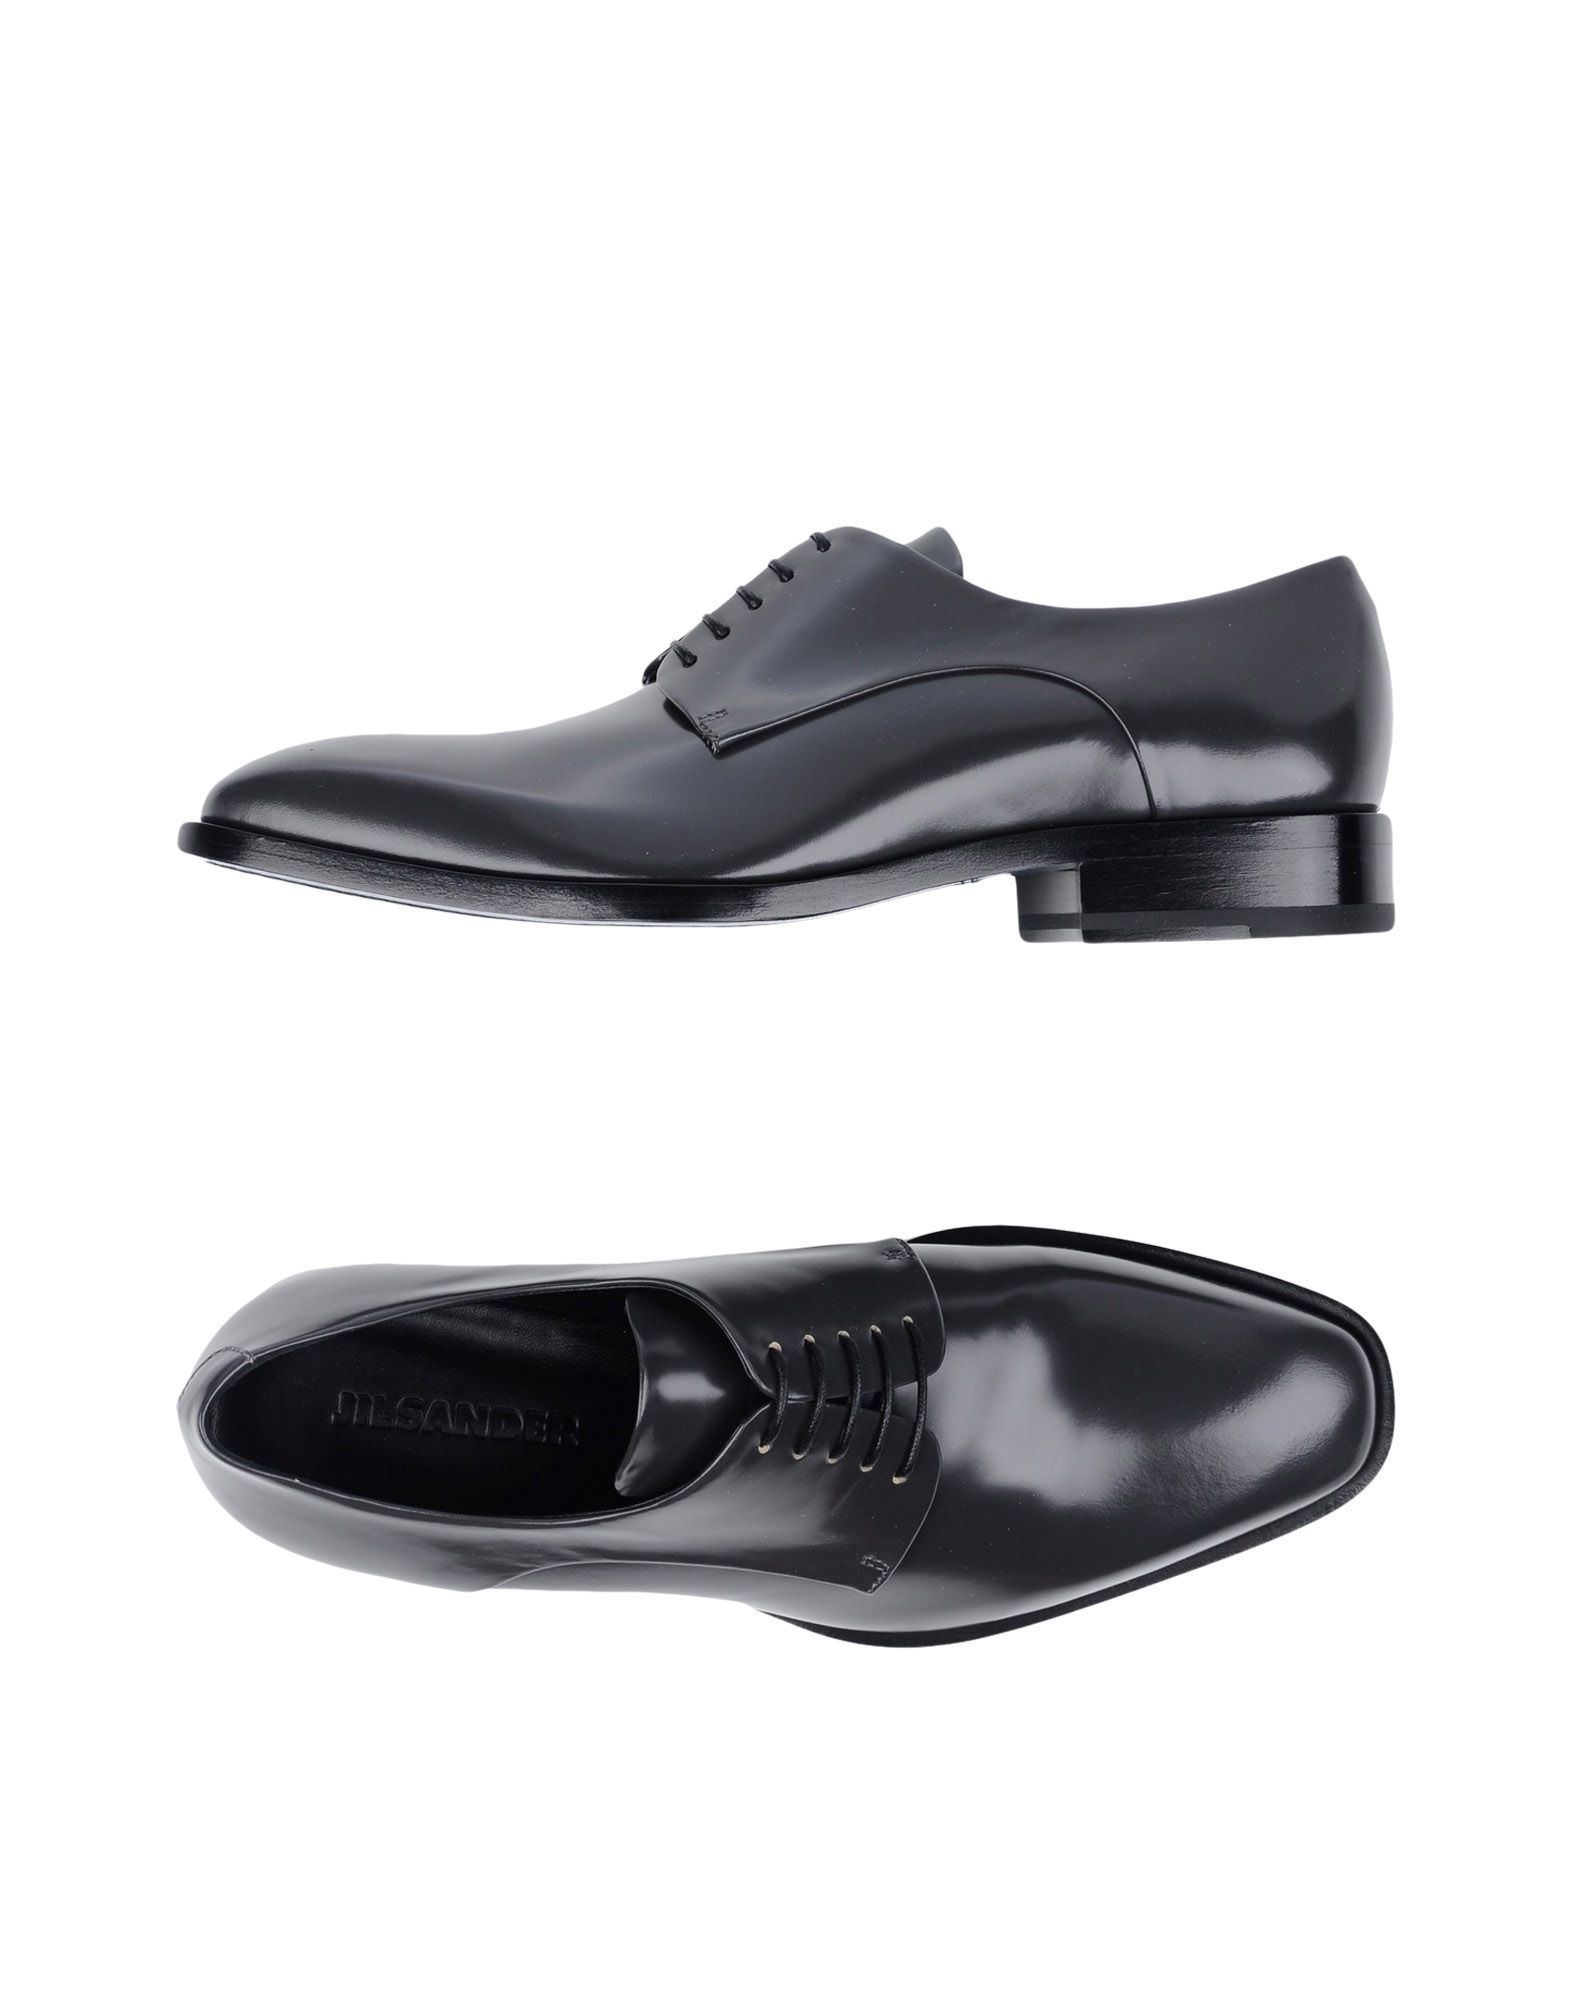 Jil Sander Lace Up Shoes Shop At Ebates